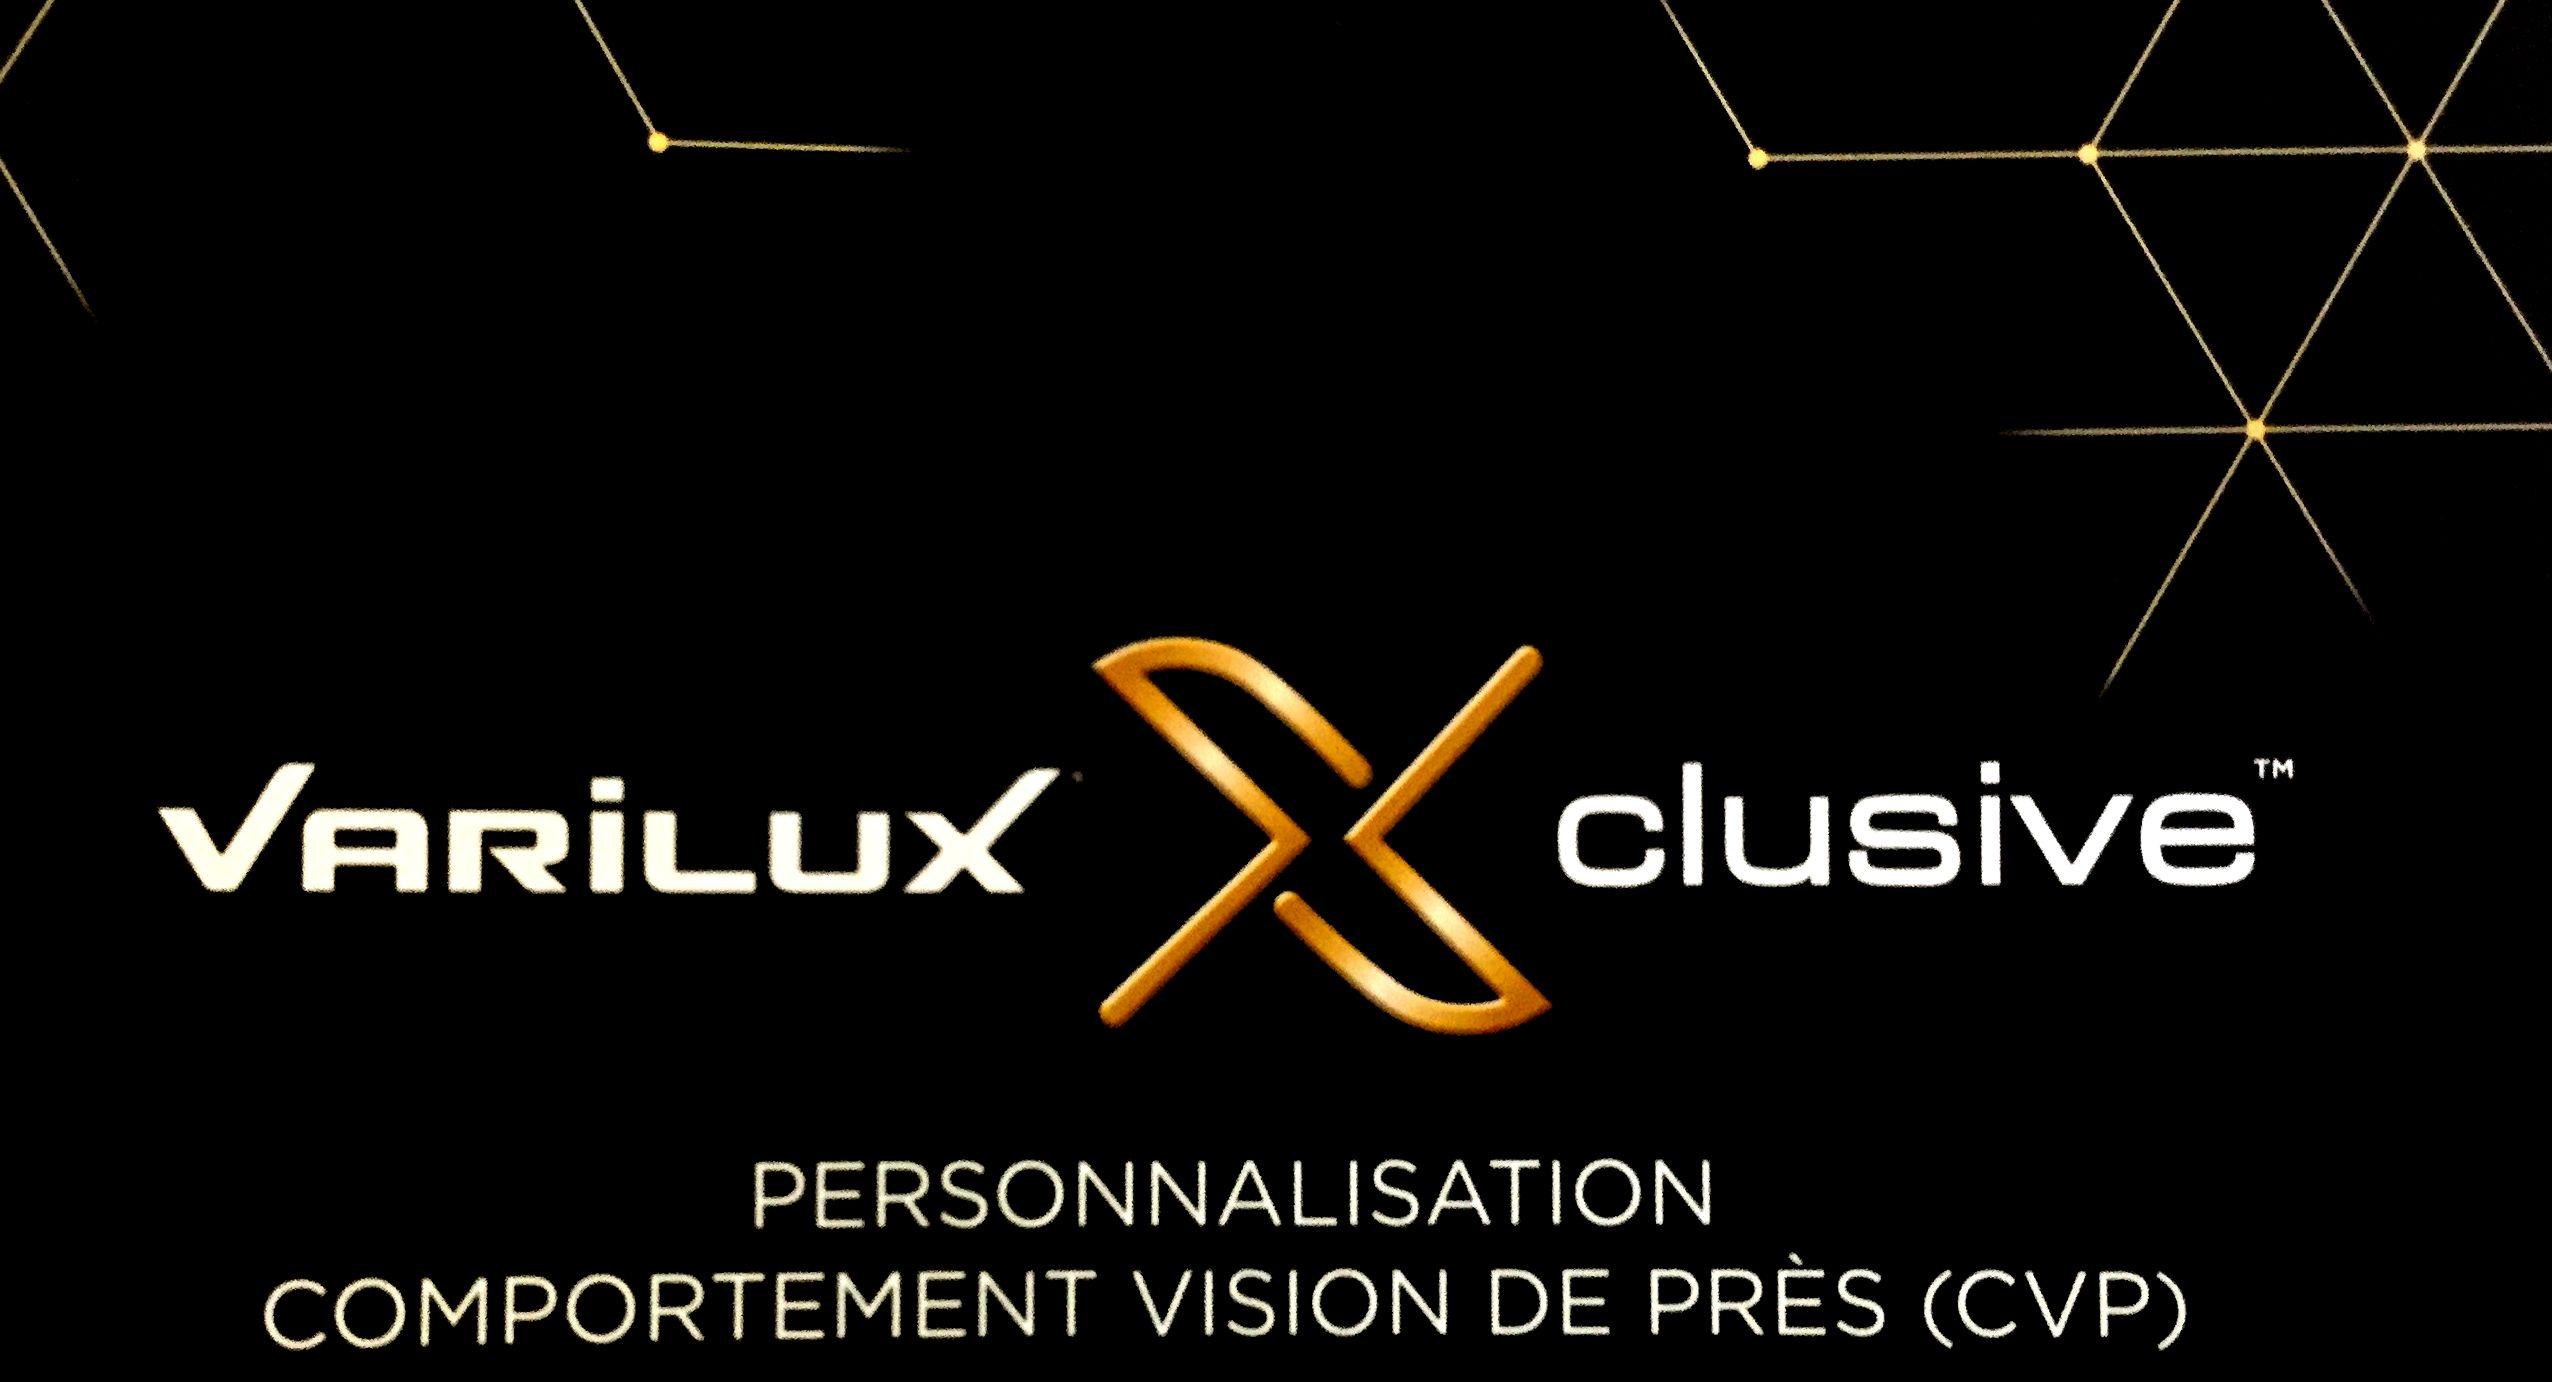 Varilux_Xclusive_Comportement_CSP_petit